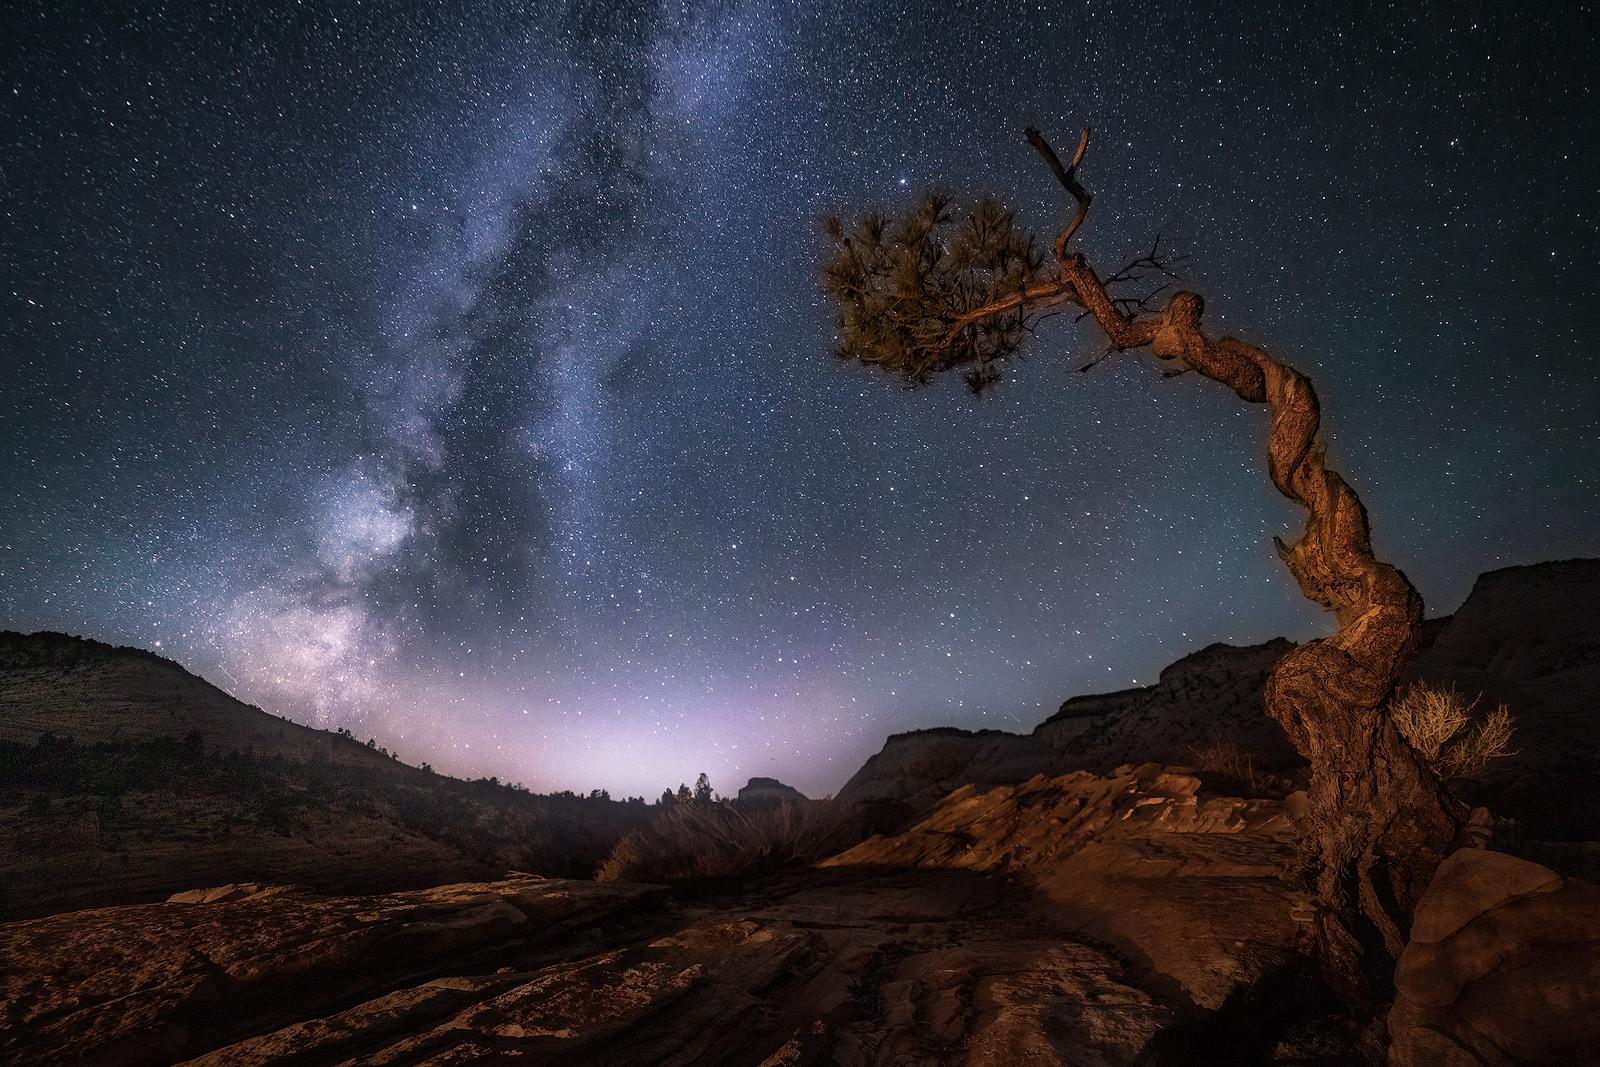 Utah, Night, Milky Way, Twisted, Tree, photo